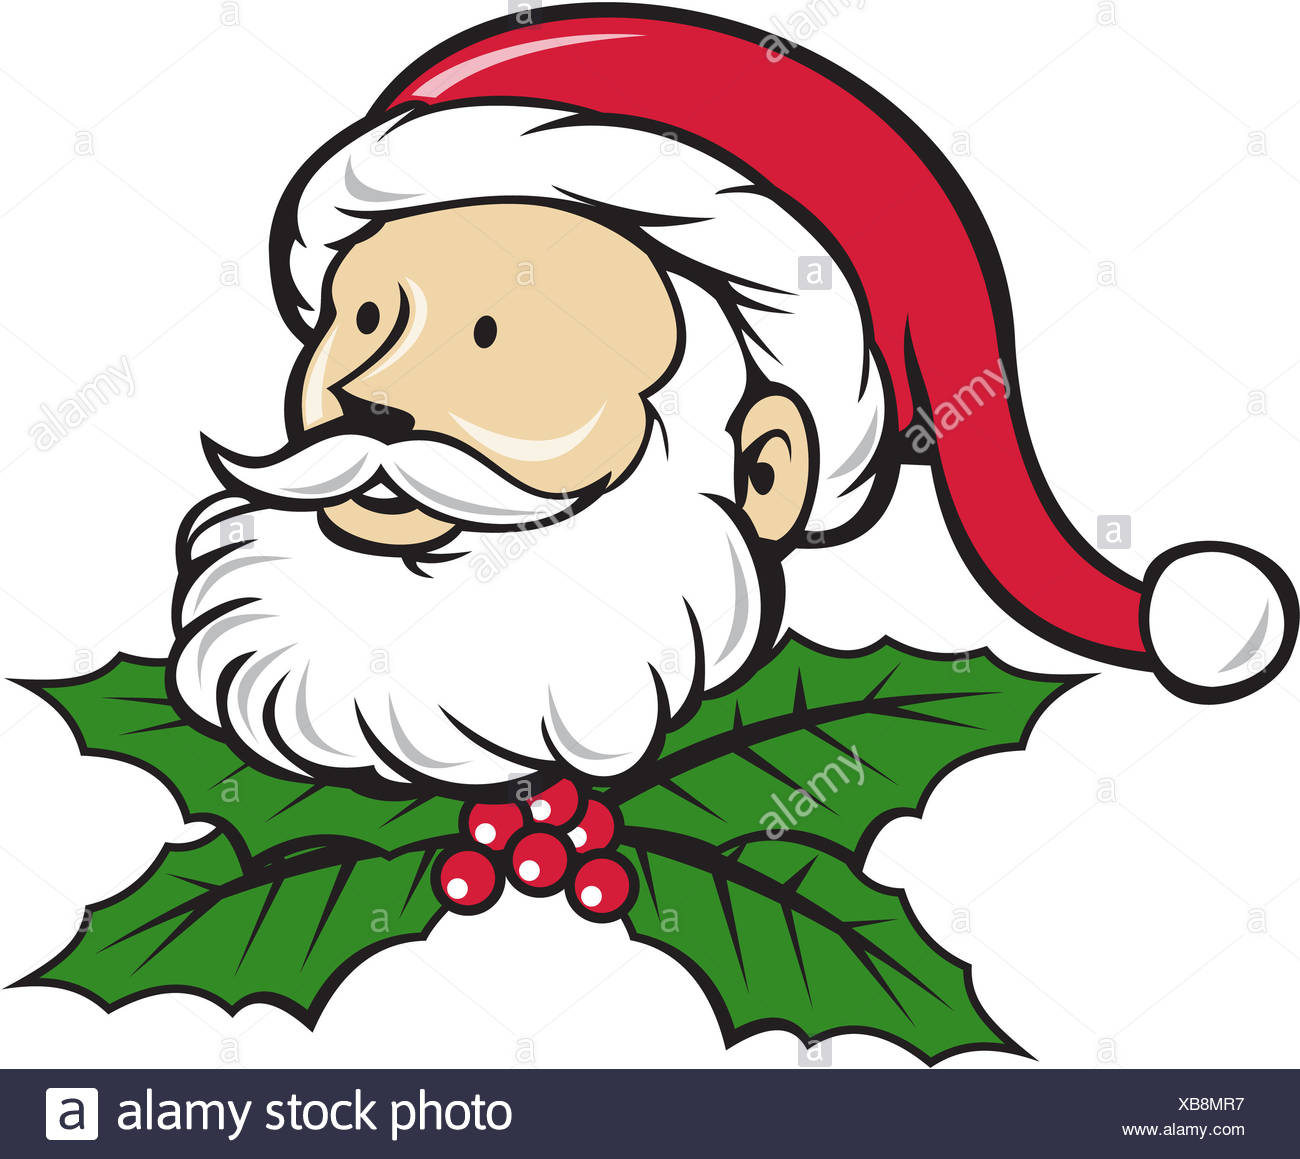 Christmas Holly Cartoon.Santa Claus Father Head Christmas Holly Cartoon Stock Photo